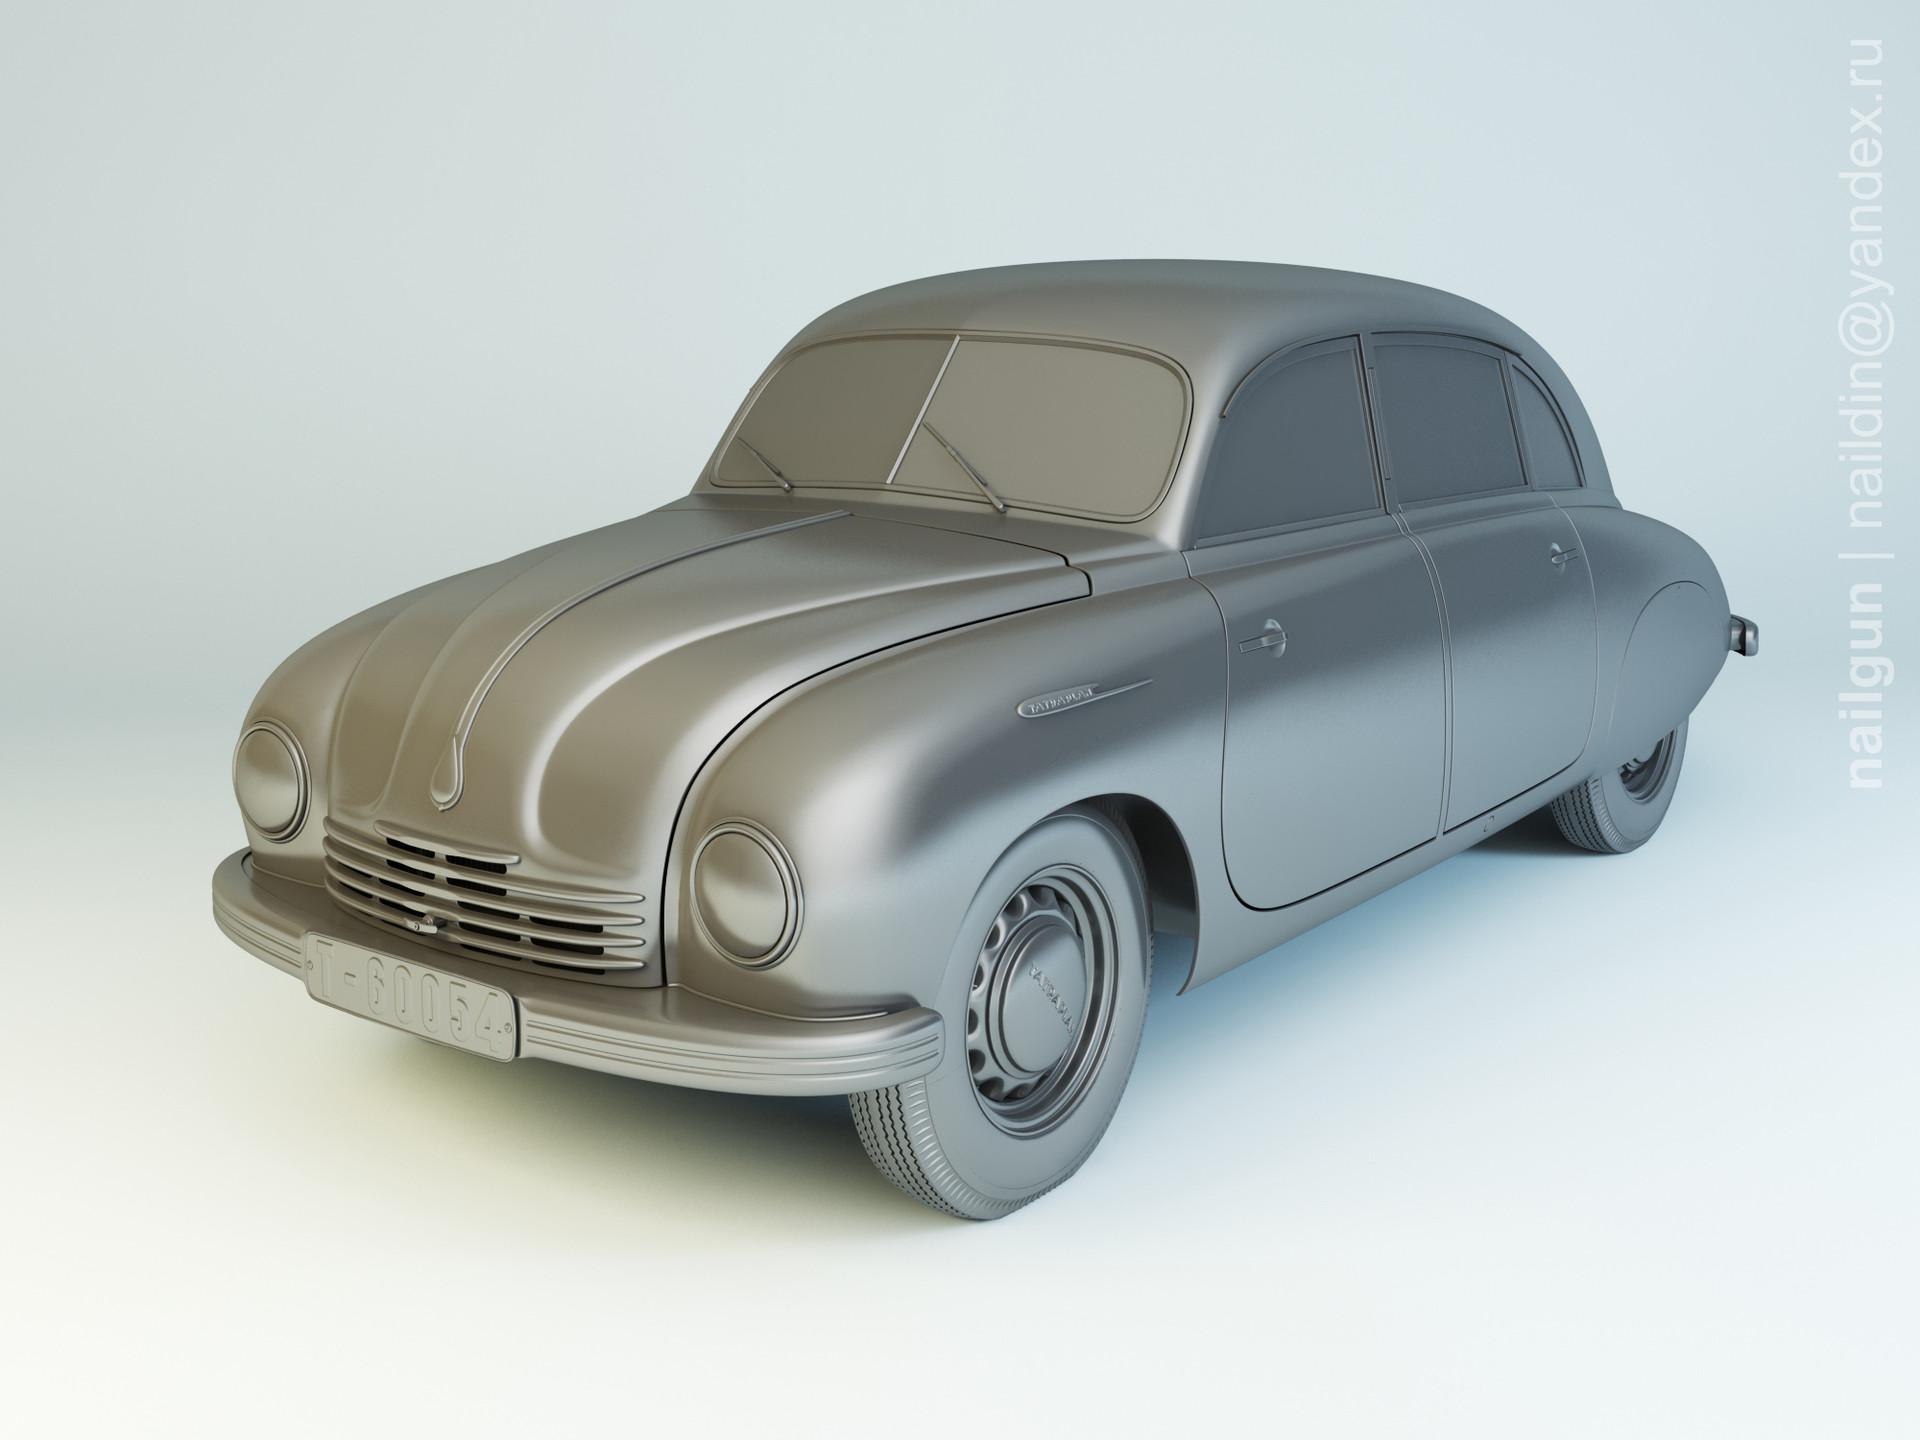 Nail khusnutdinov als 197 004 tatra t 600 modelling 0